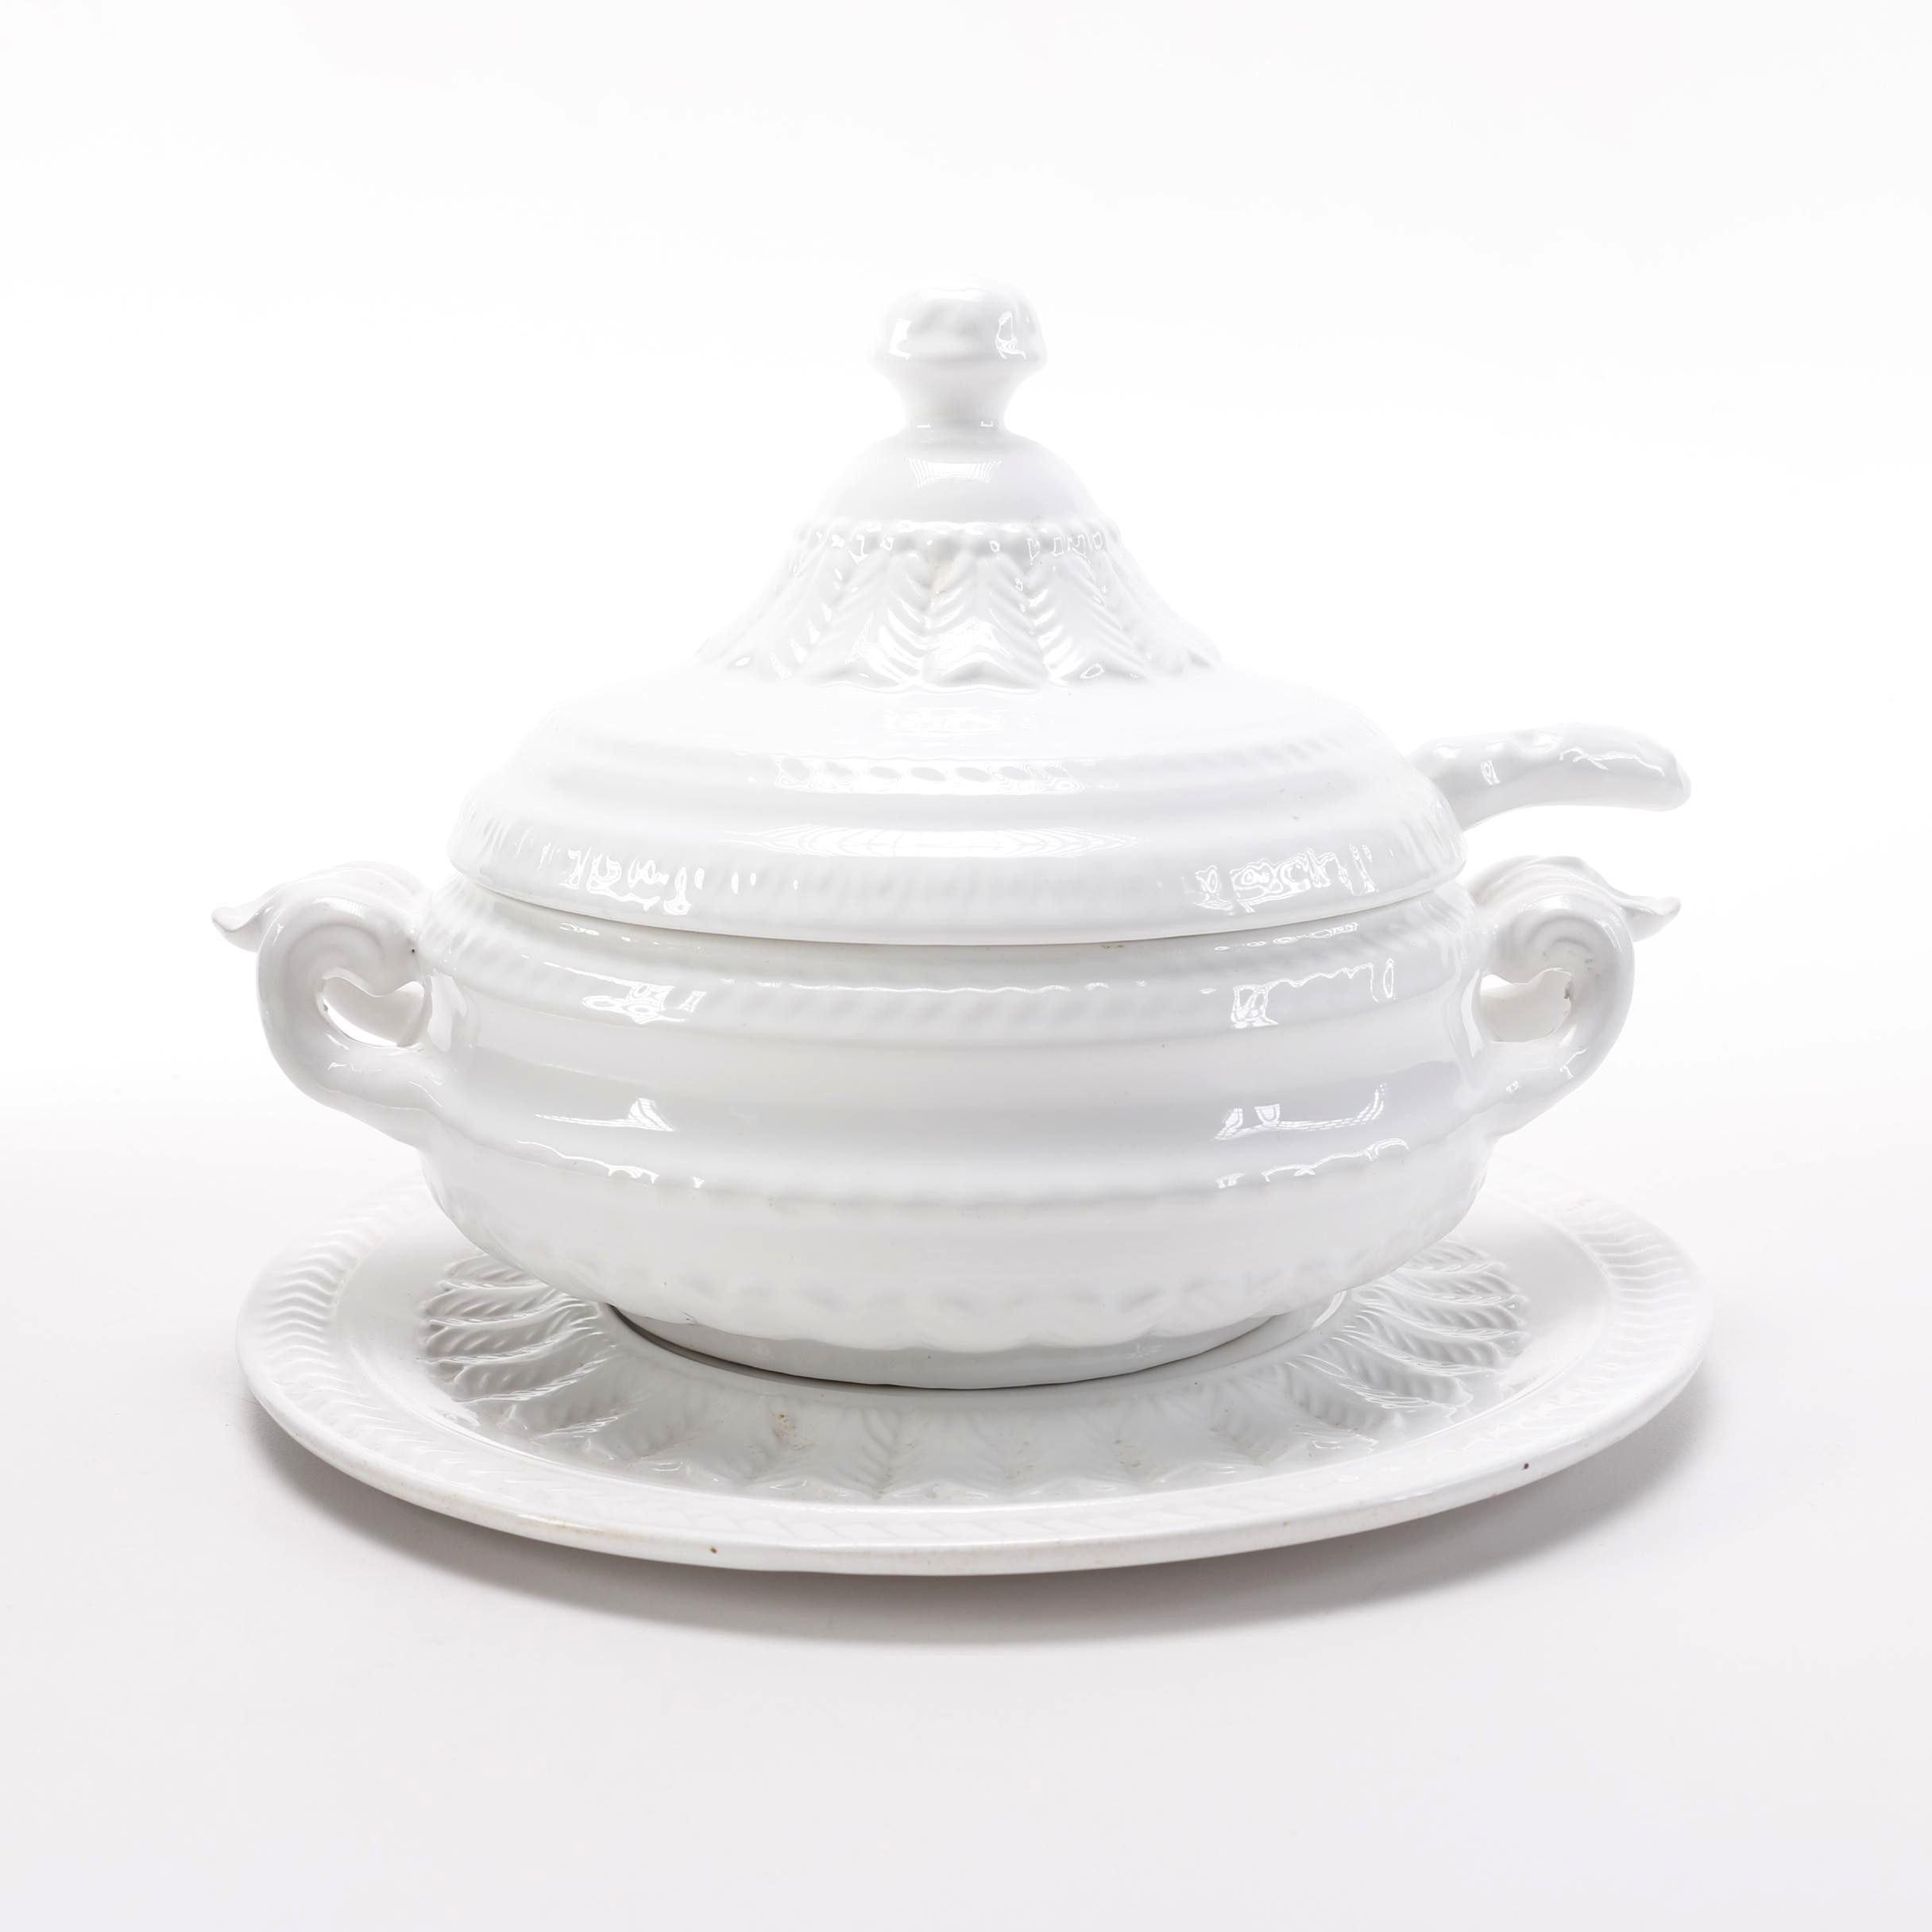 Portuguese Ceramic Soup Tureen Ebth